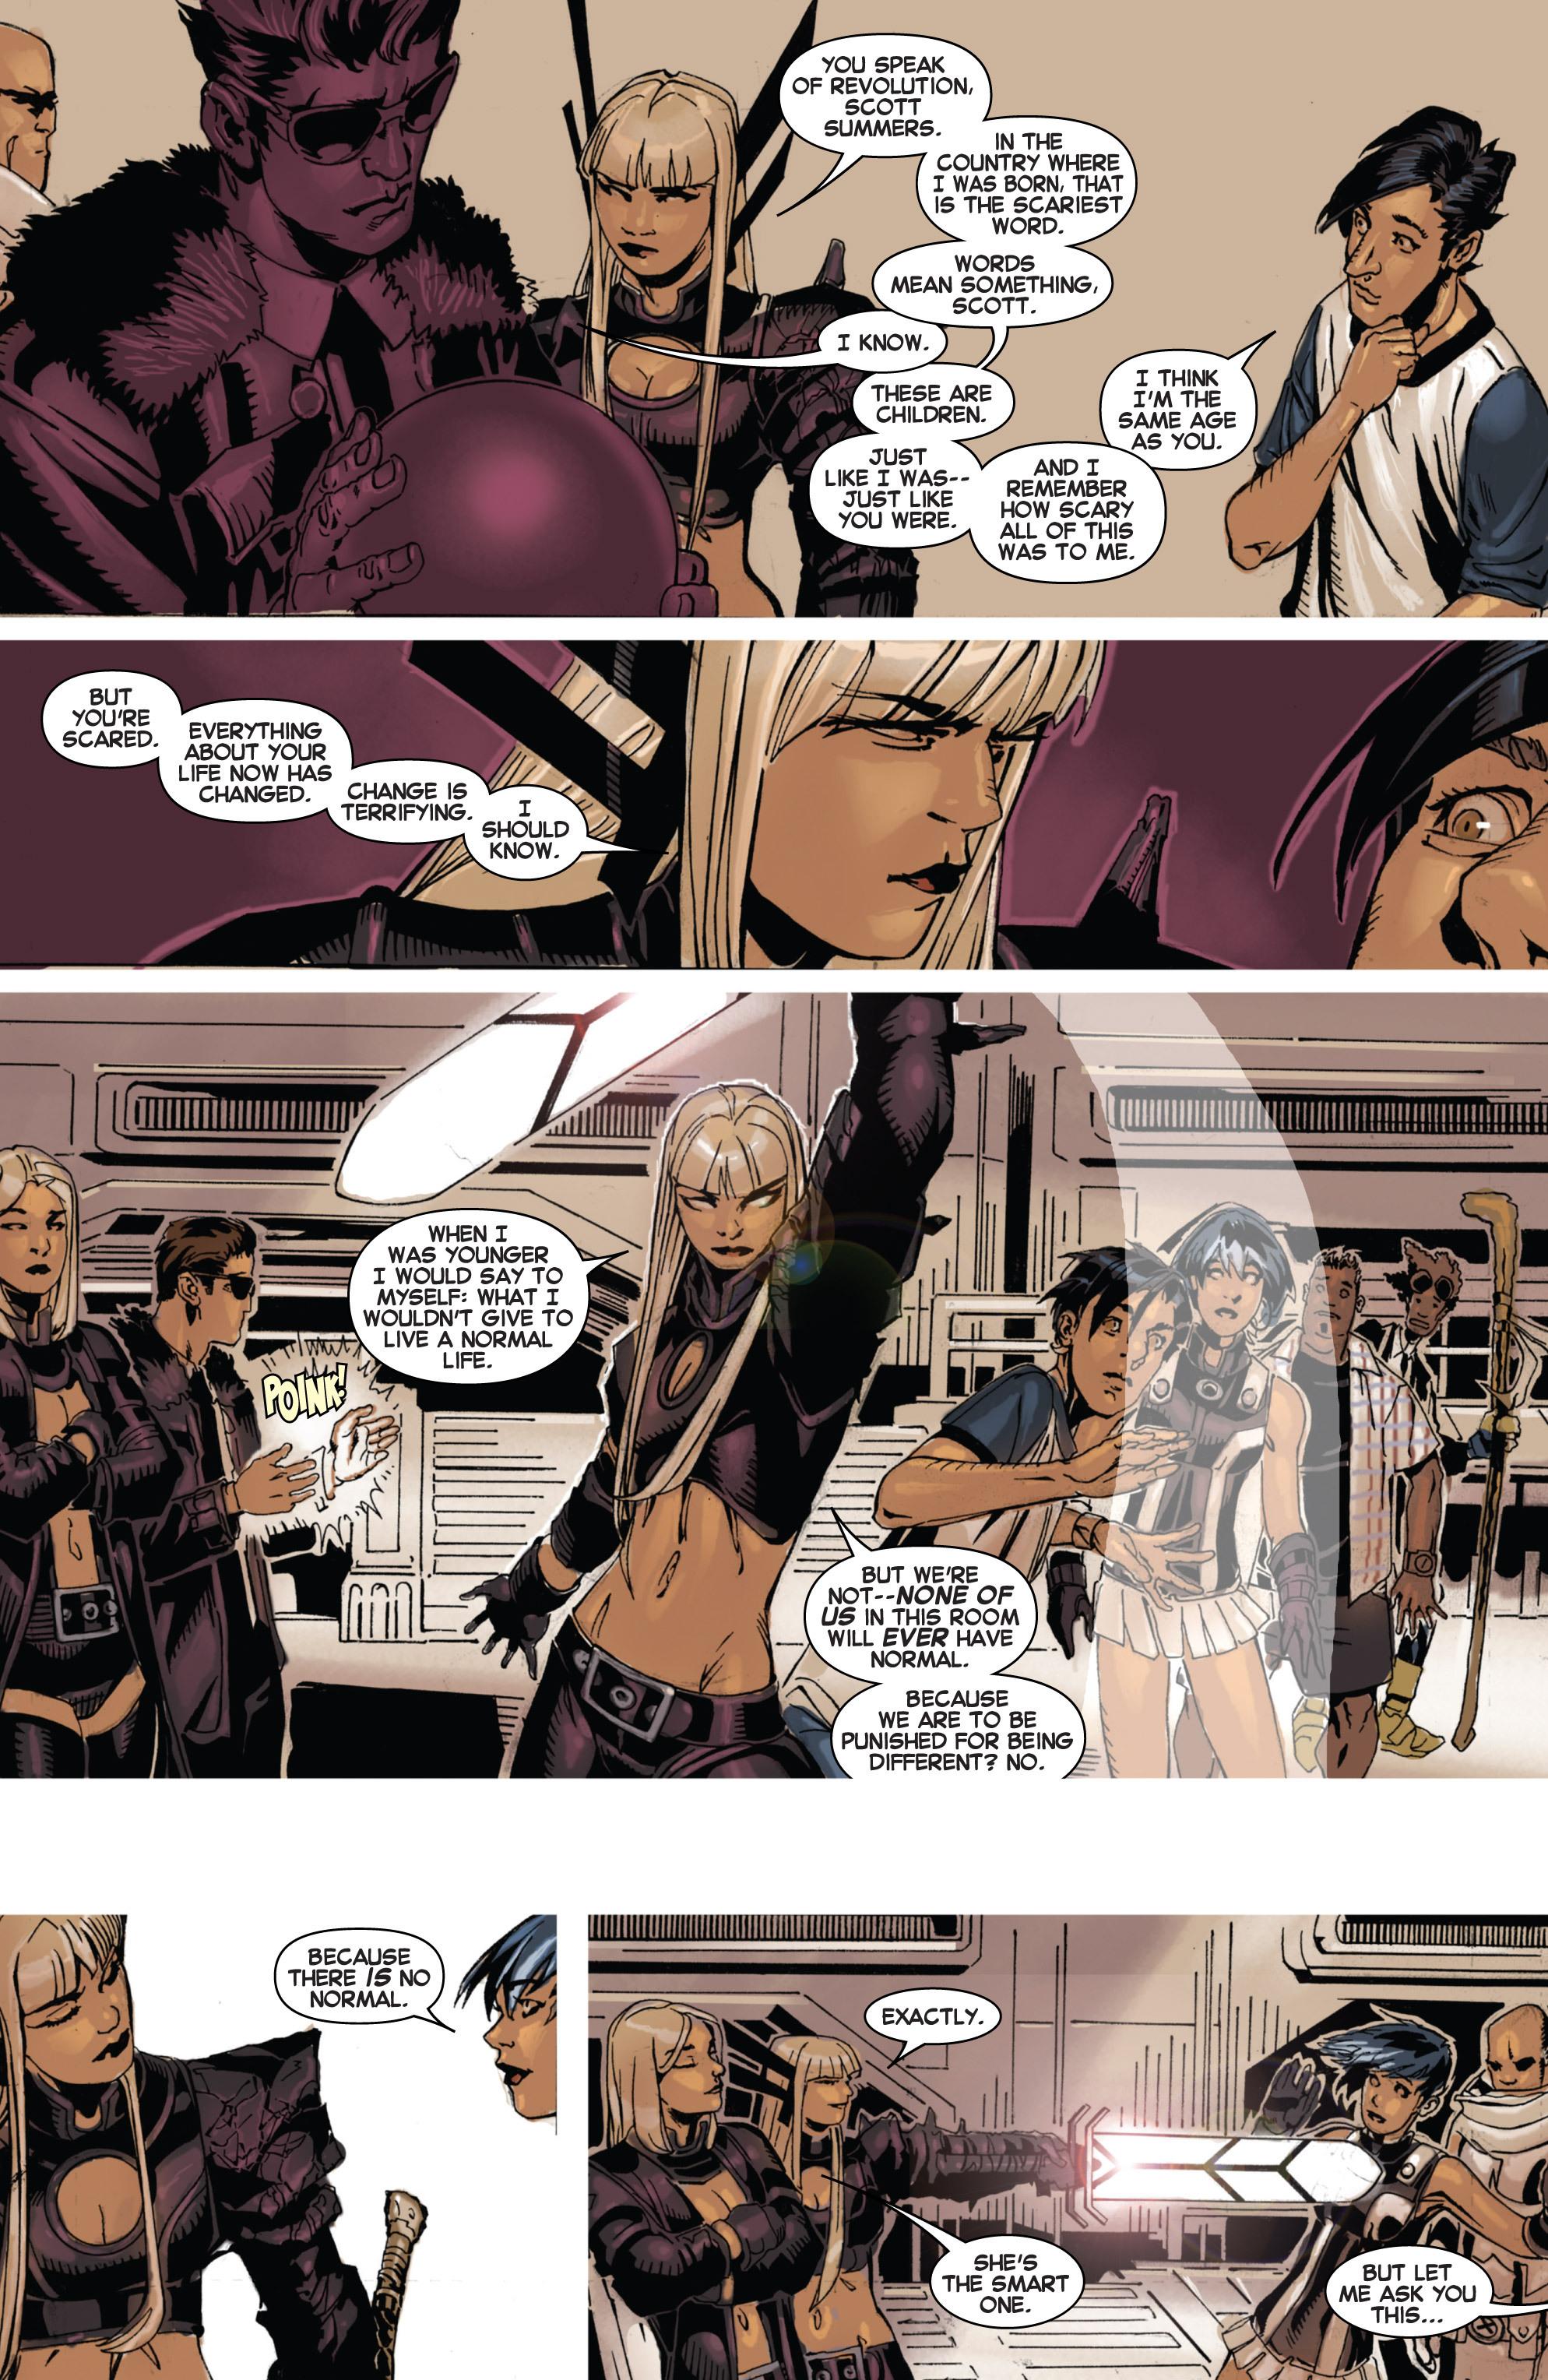 Read online Uncanny X-Men (2013) comic -  Issue # _TPB 1 - Revolution - 38